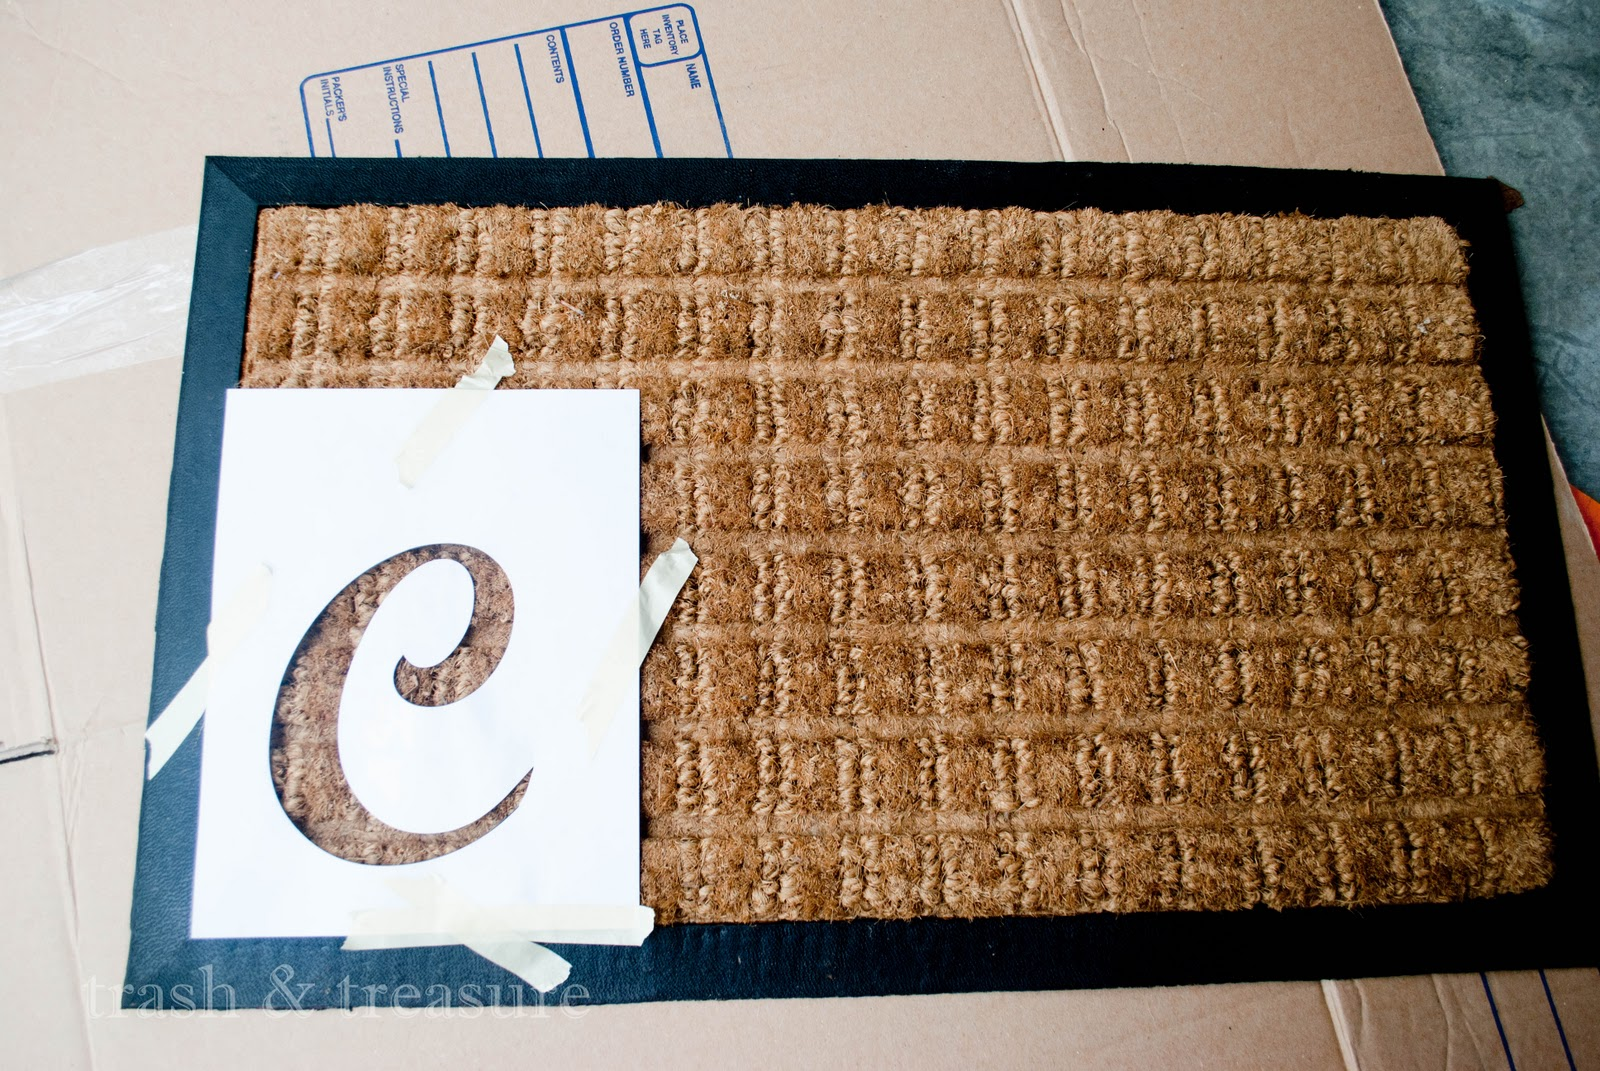 My Trash And Treasure Diy Quicky Doormat Customization